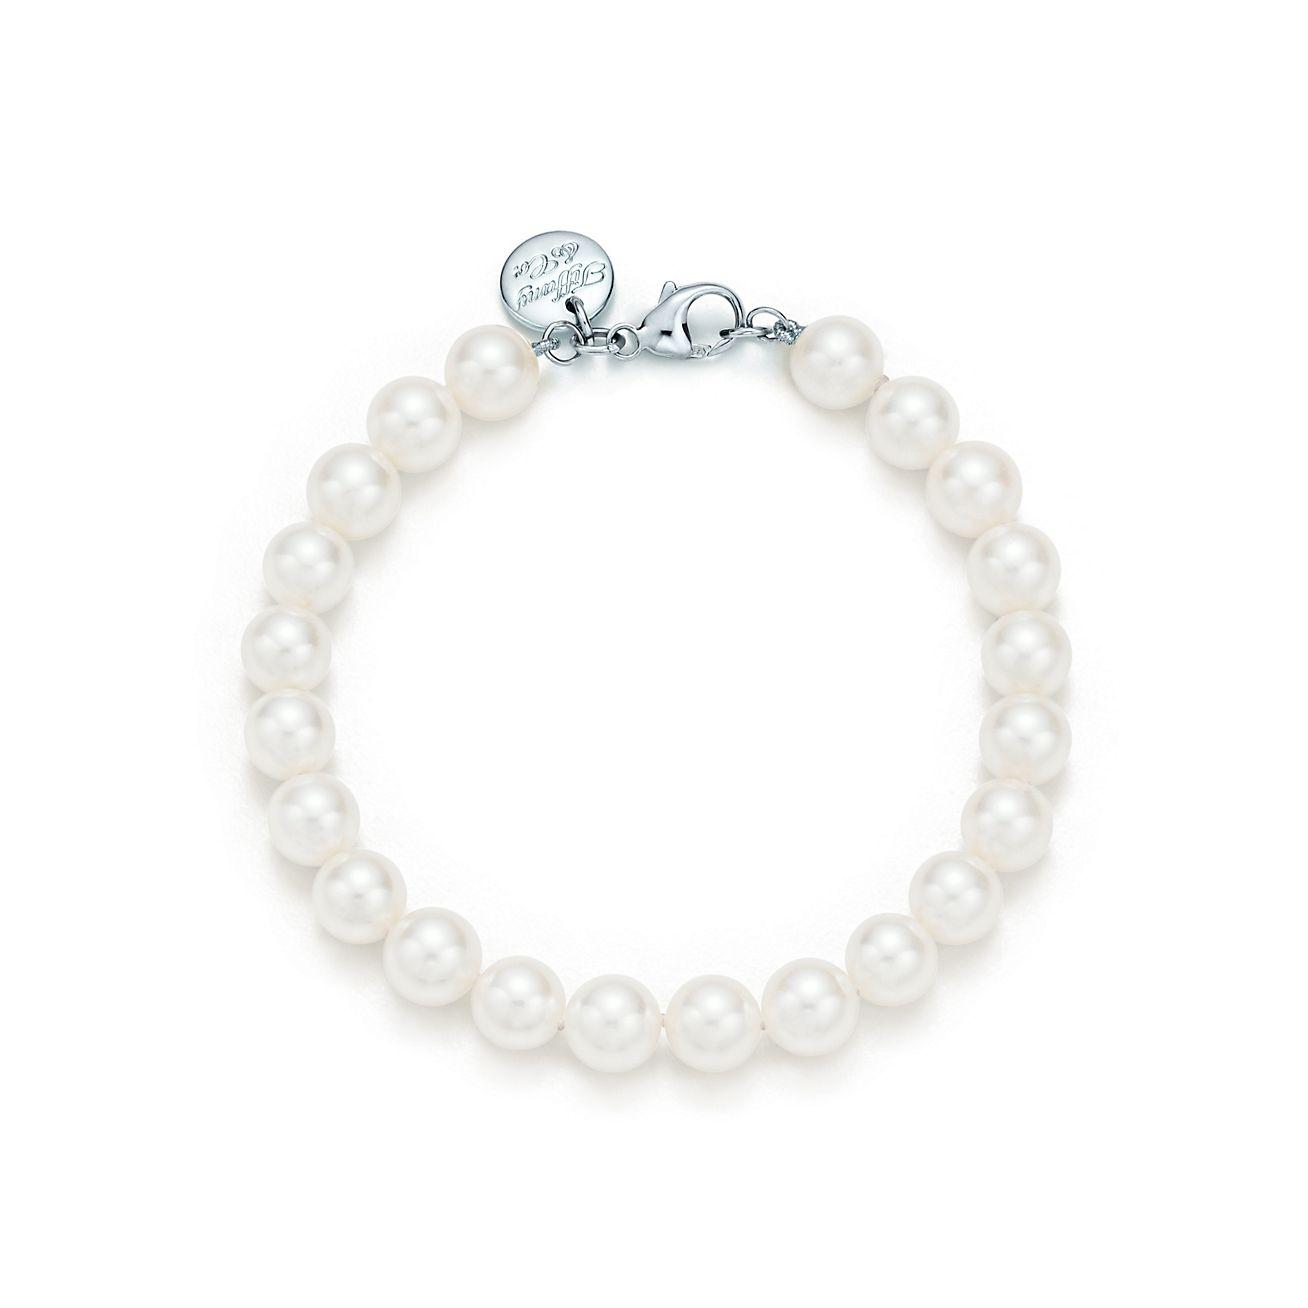 tiffany essential bracelet of akoya pearls with an 18k